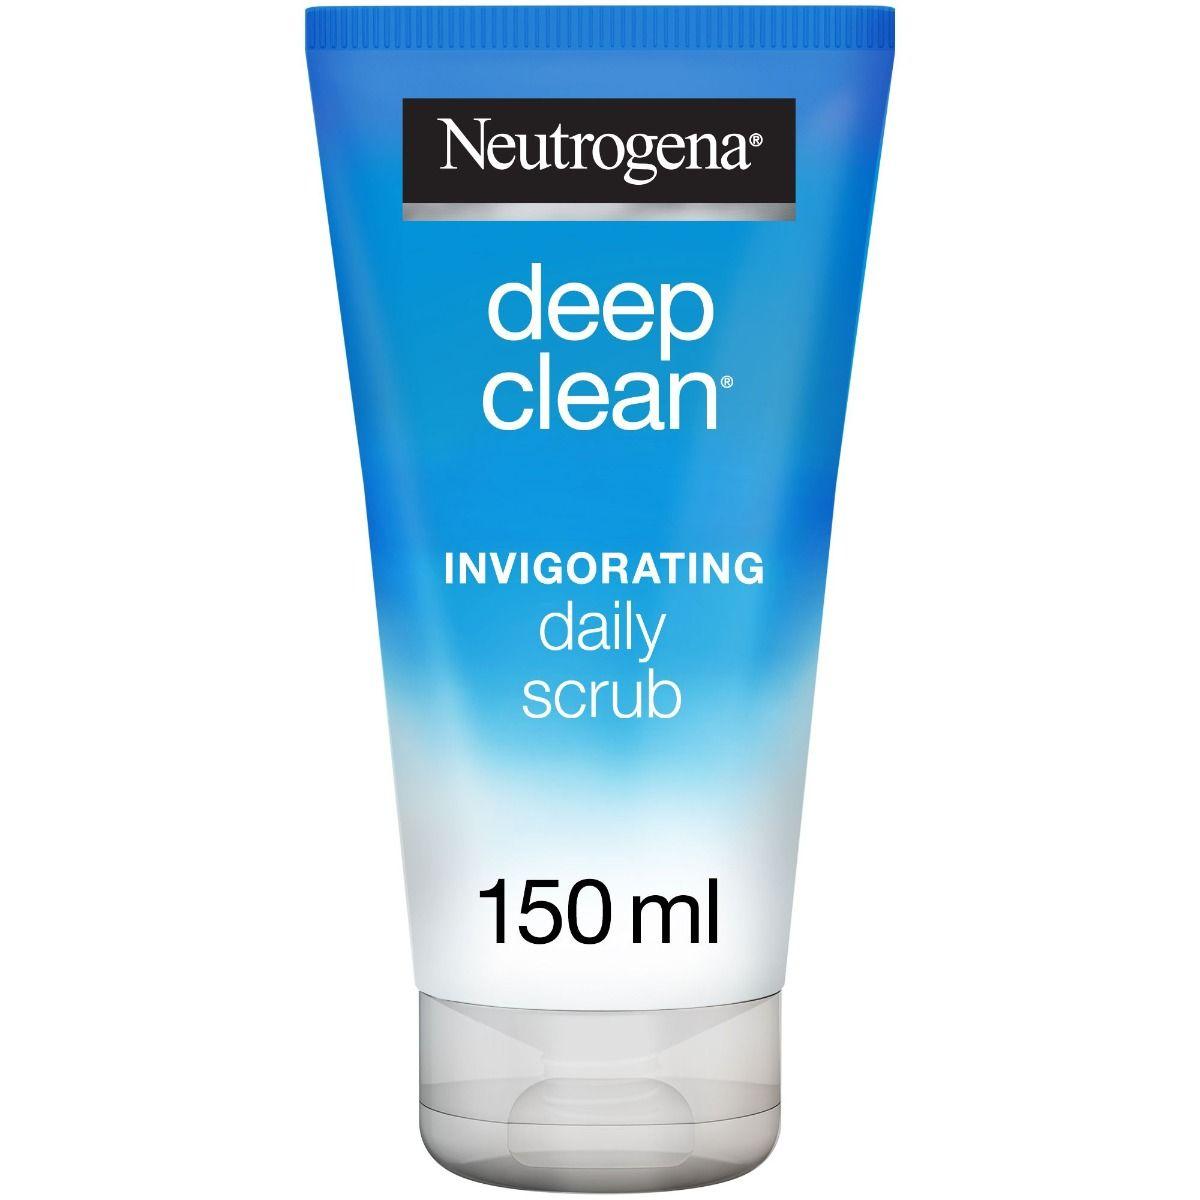 neutrogena deep clean